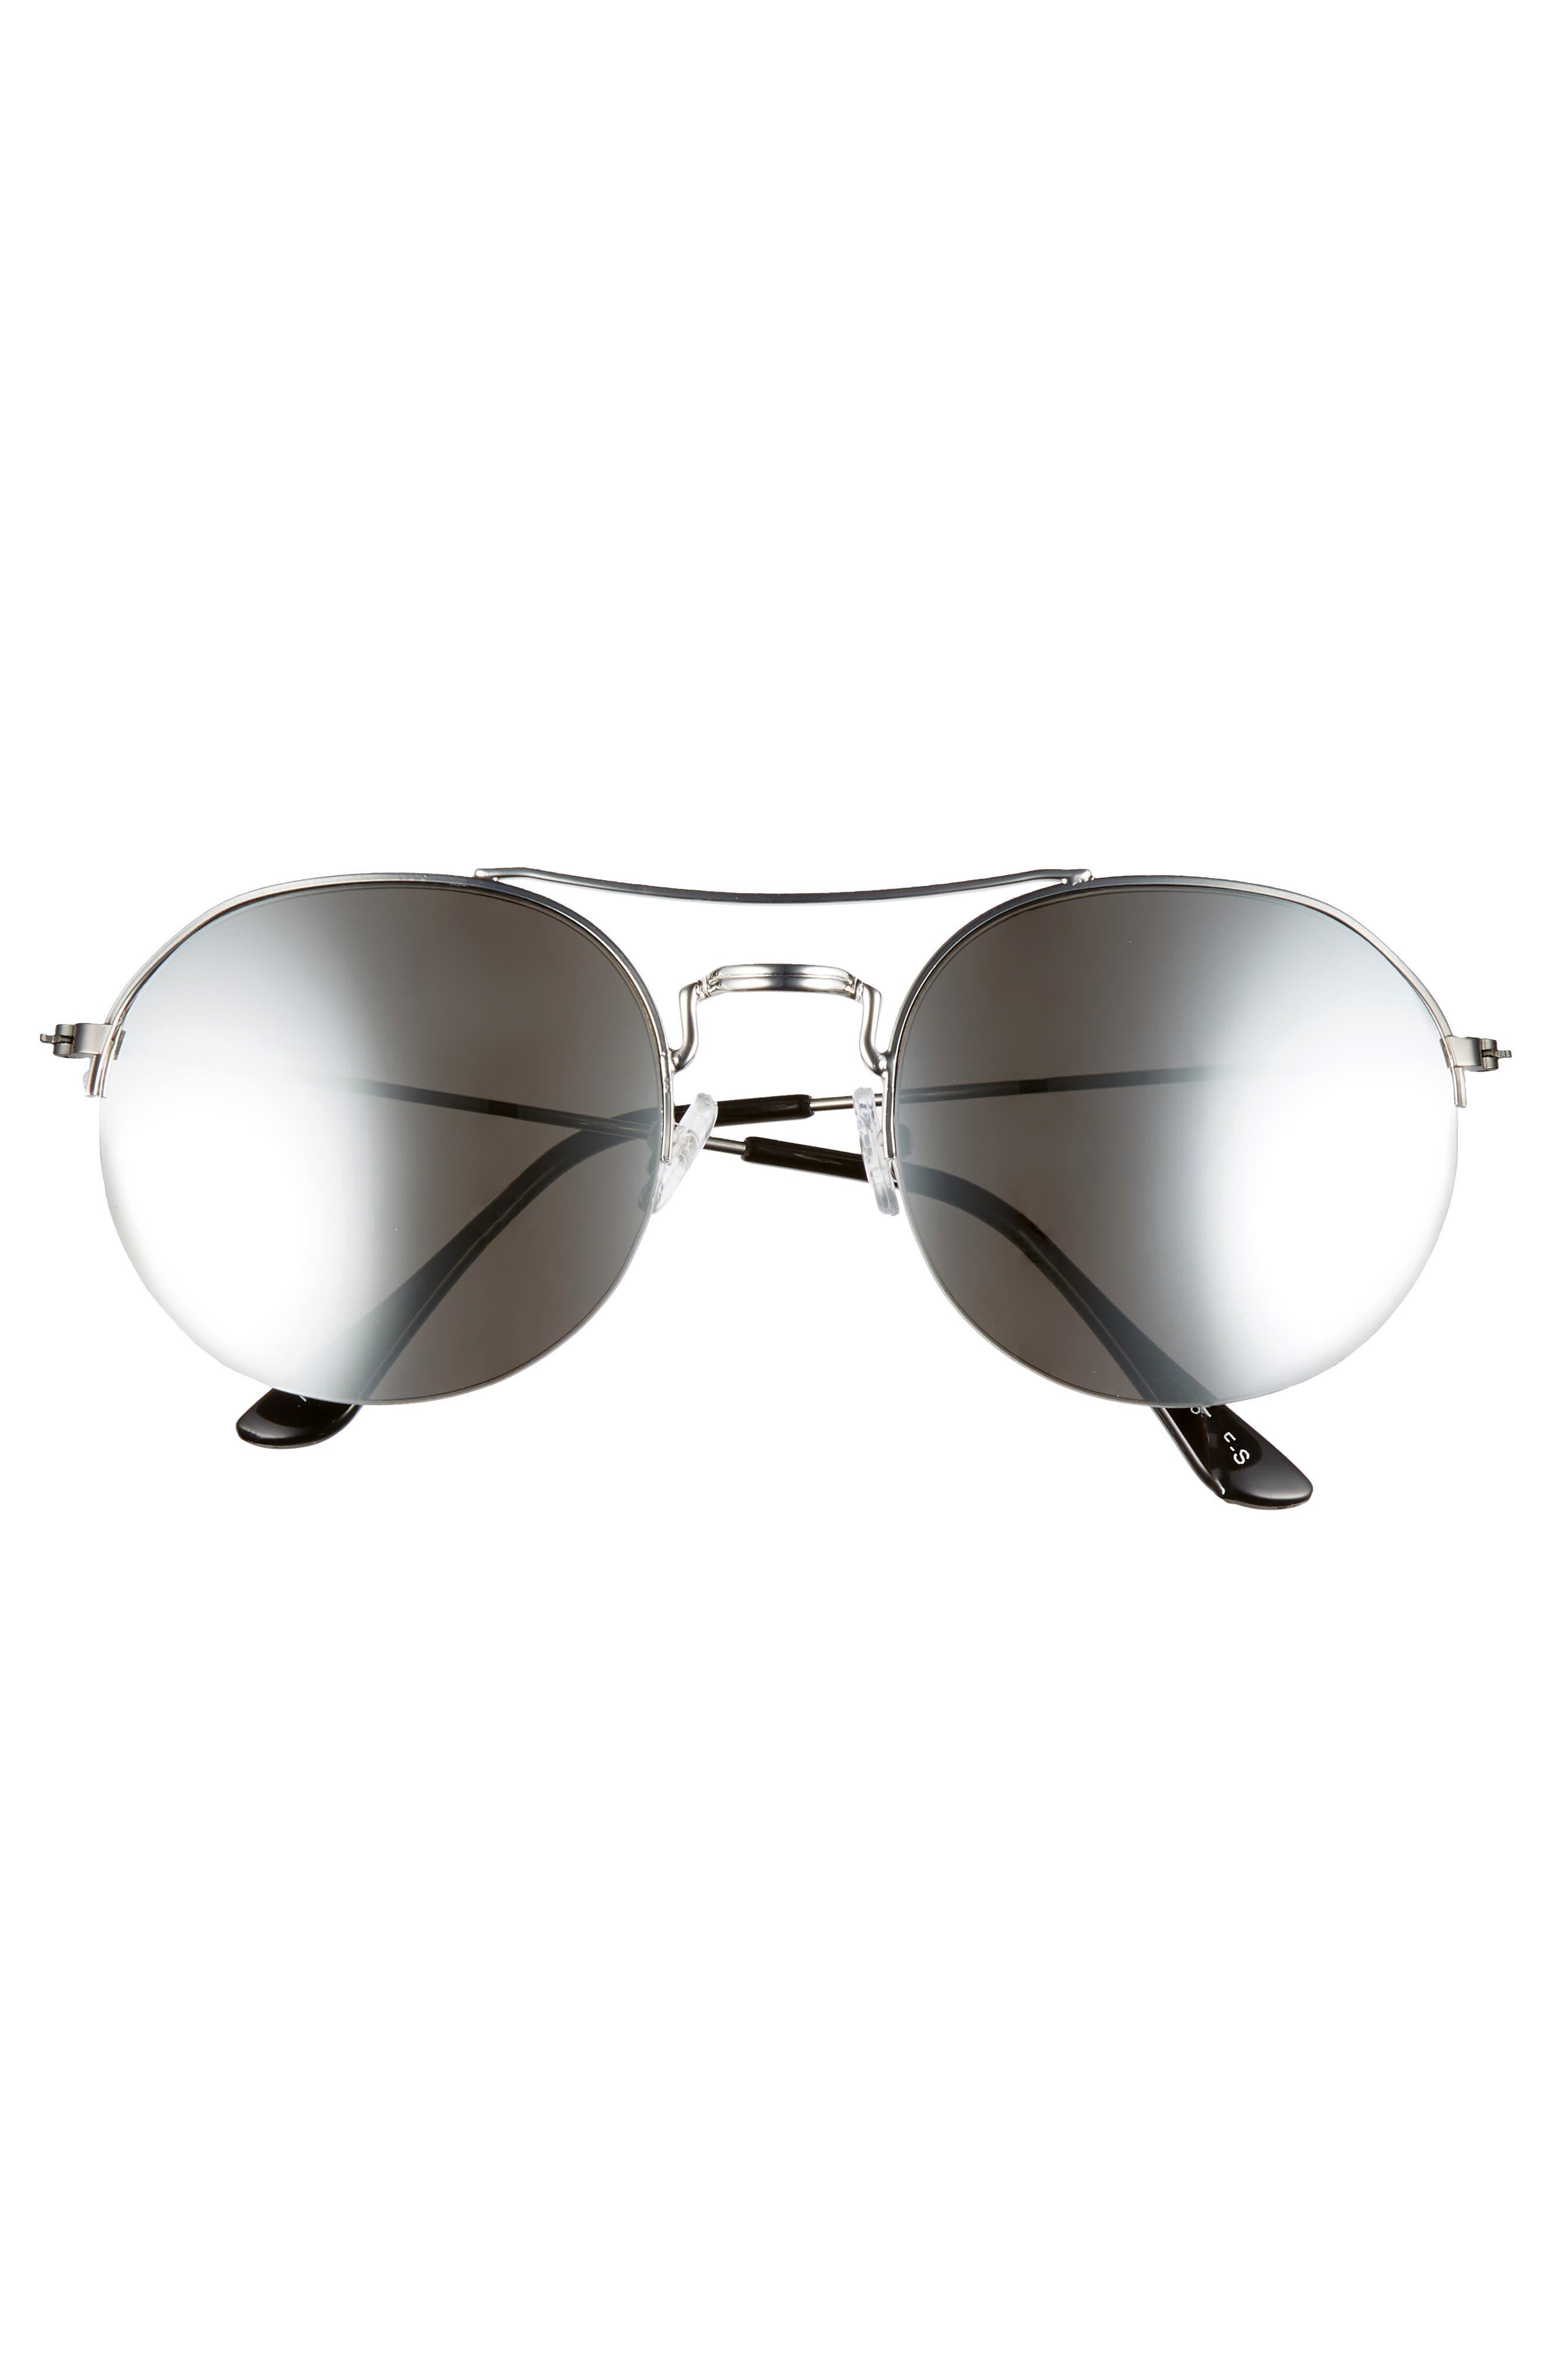 55mm Round Metal Aviator Sunglasses,                             Alternate thumbnail 3, color,                             DARK GREY